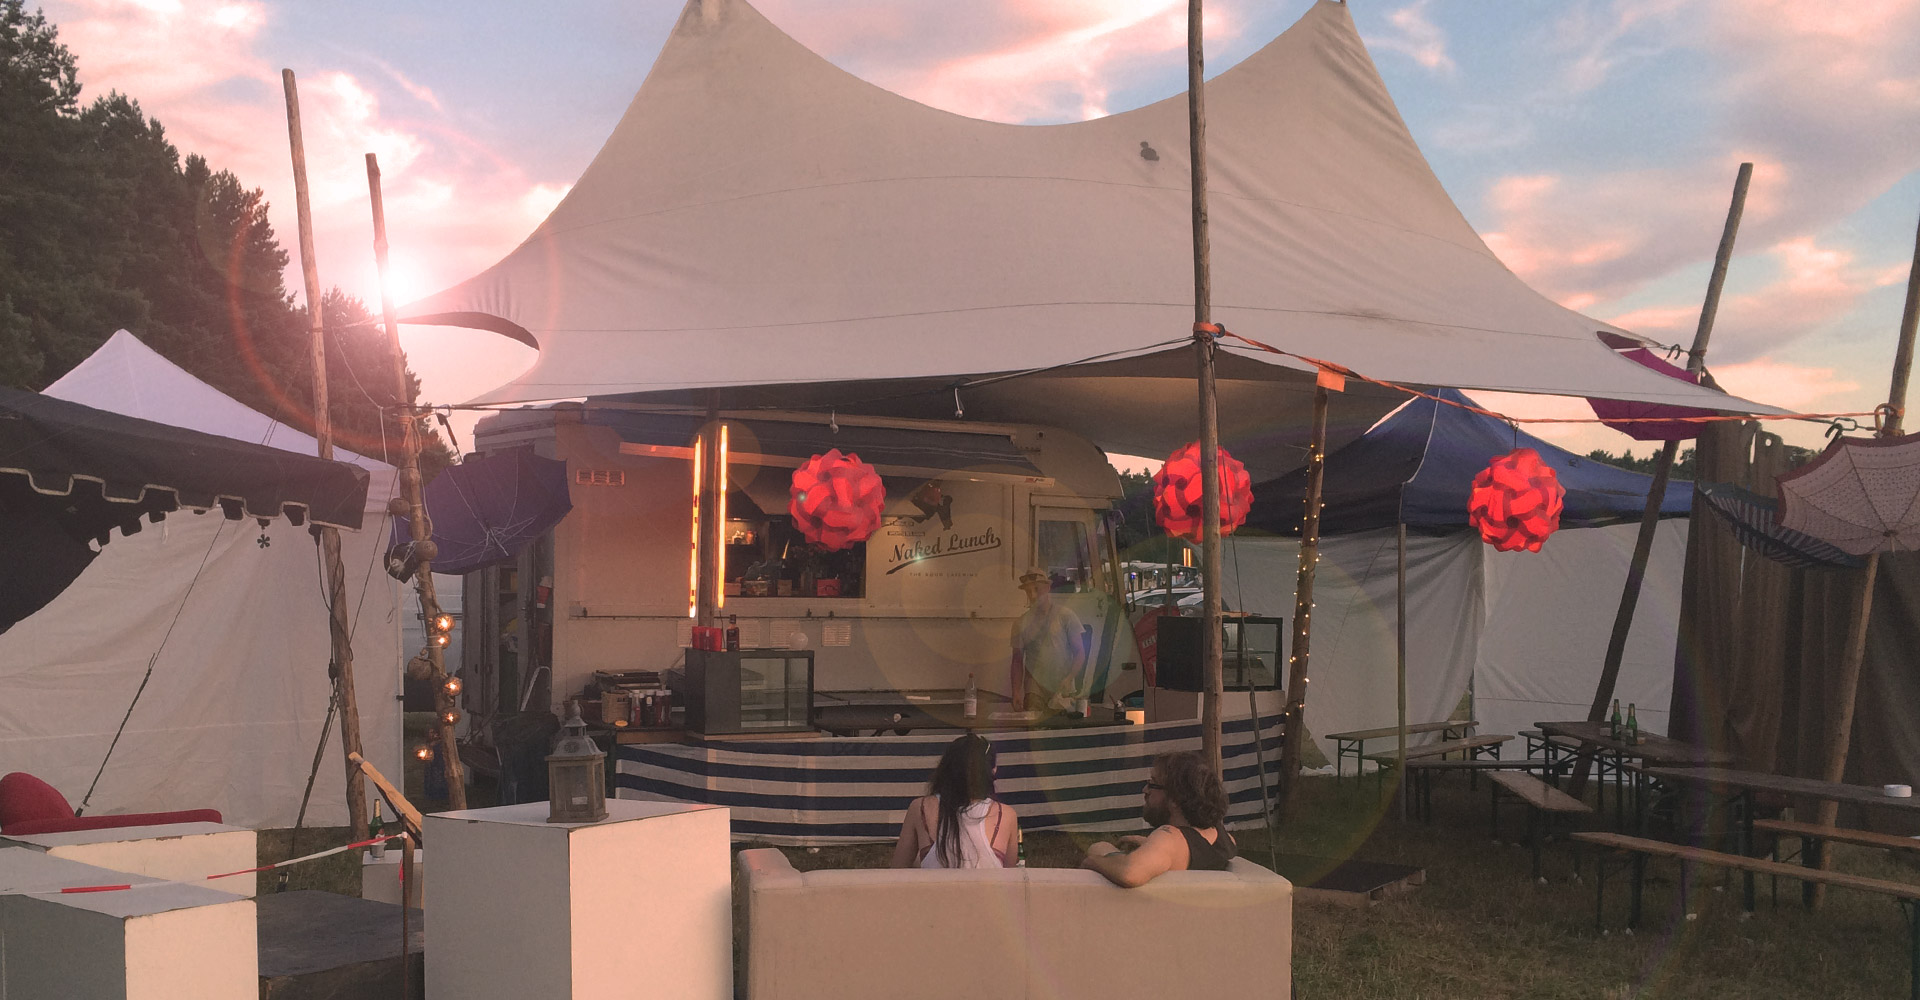 Catering Foot Truck bei Festivals mit Zelt